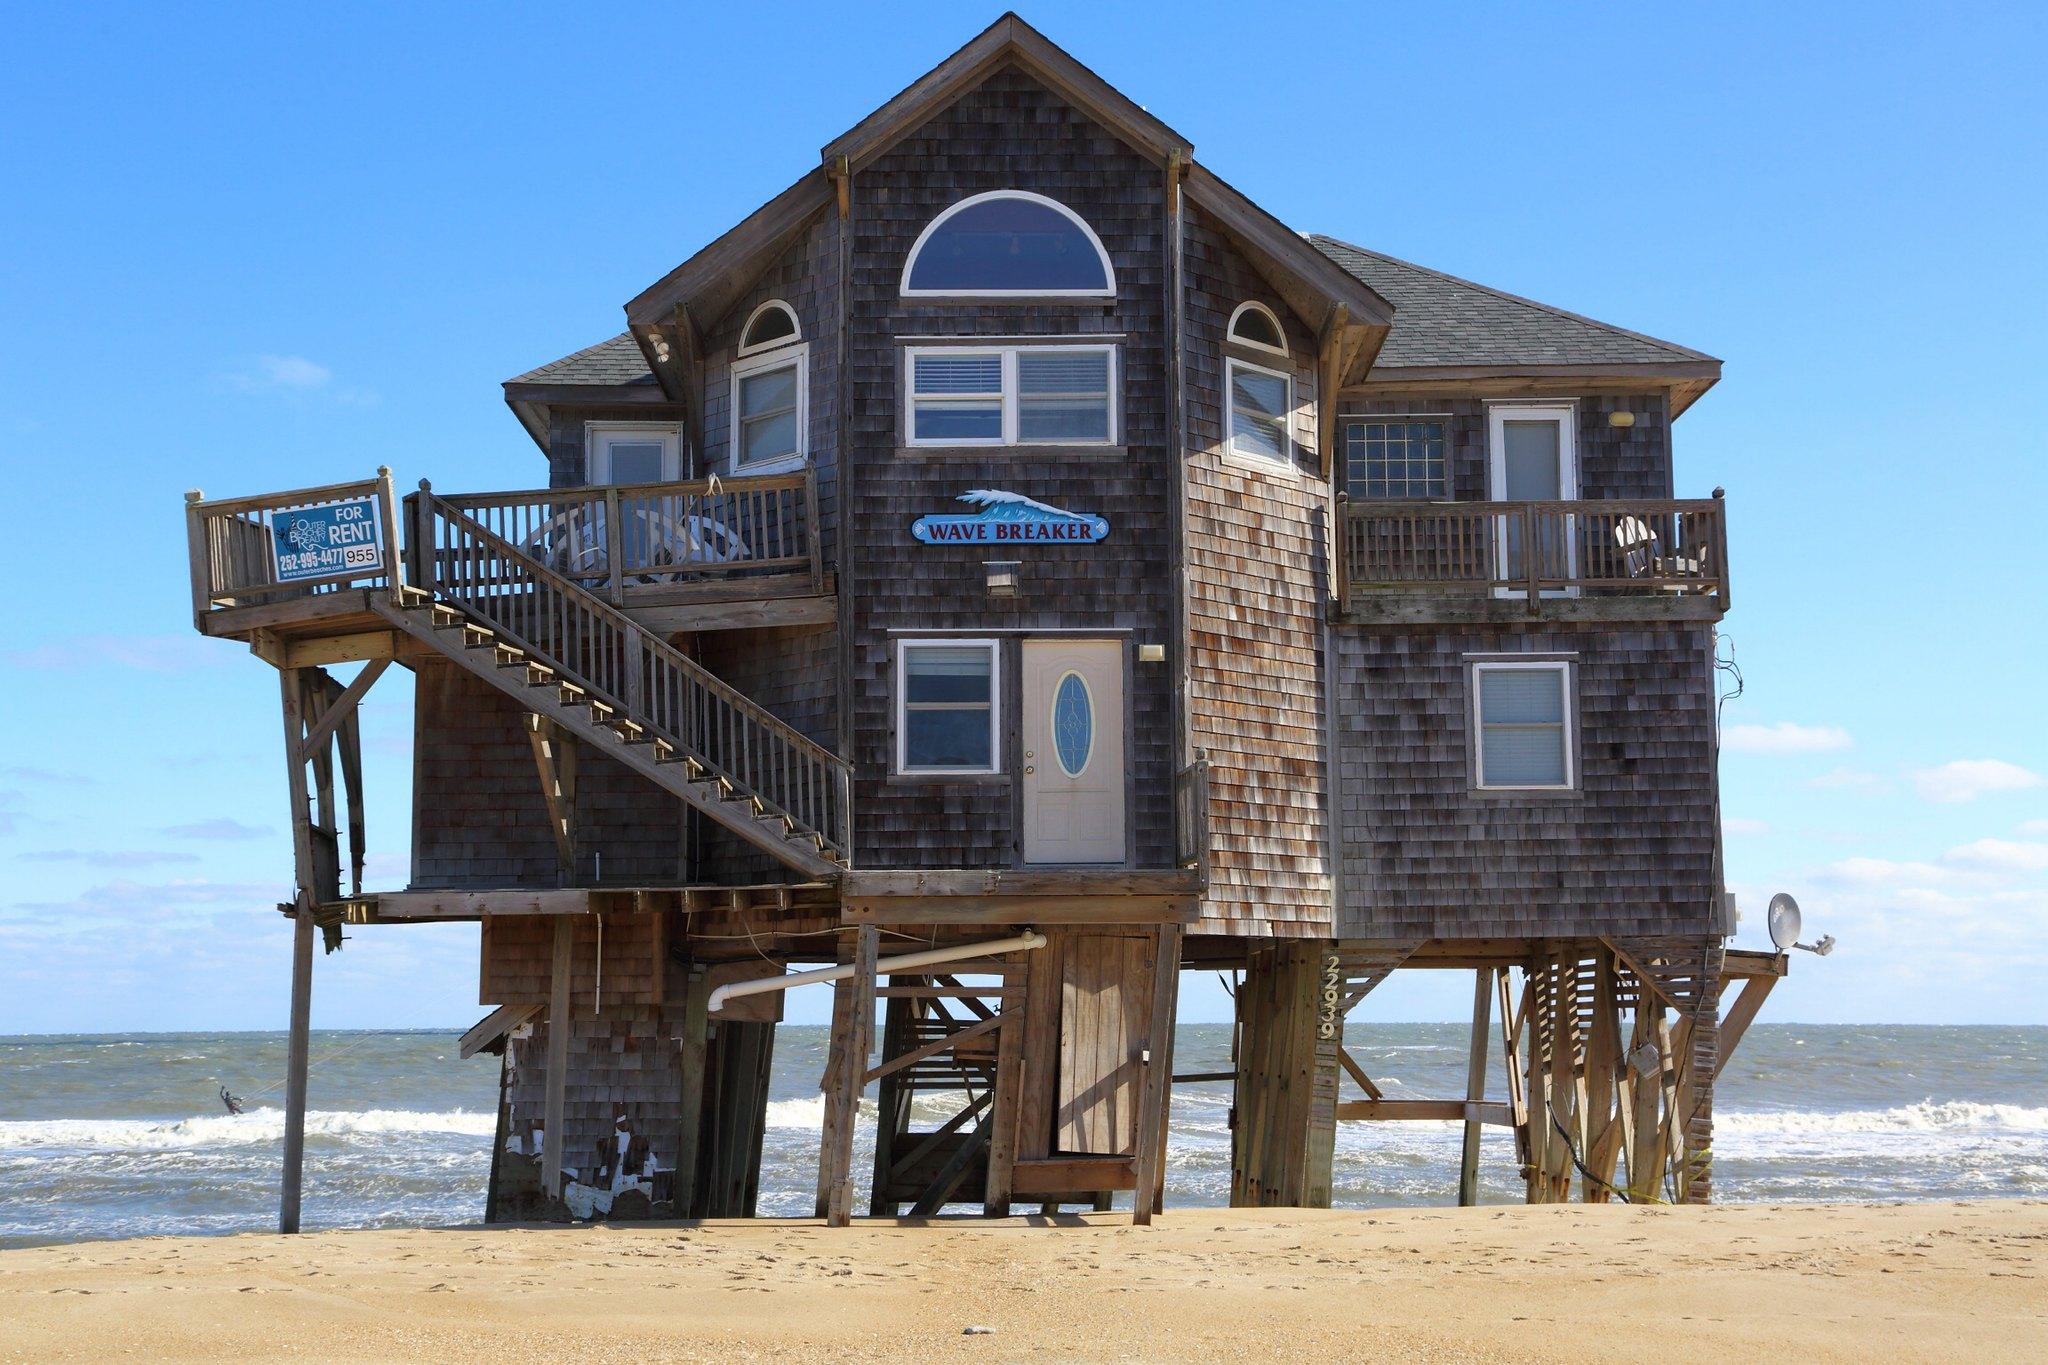 Wave Breaker House a Mirlo Beach, North Carolina